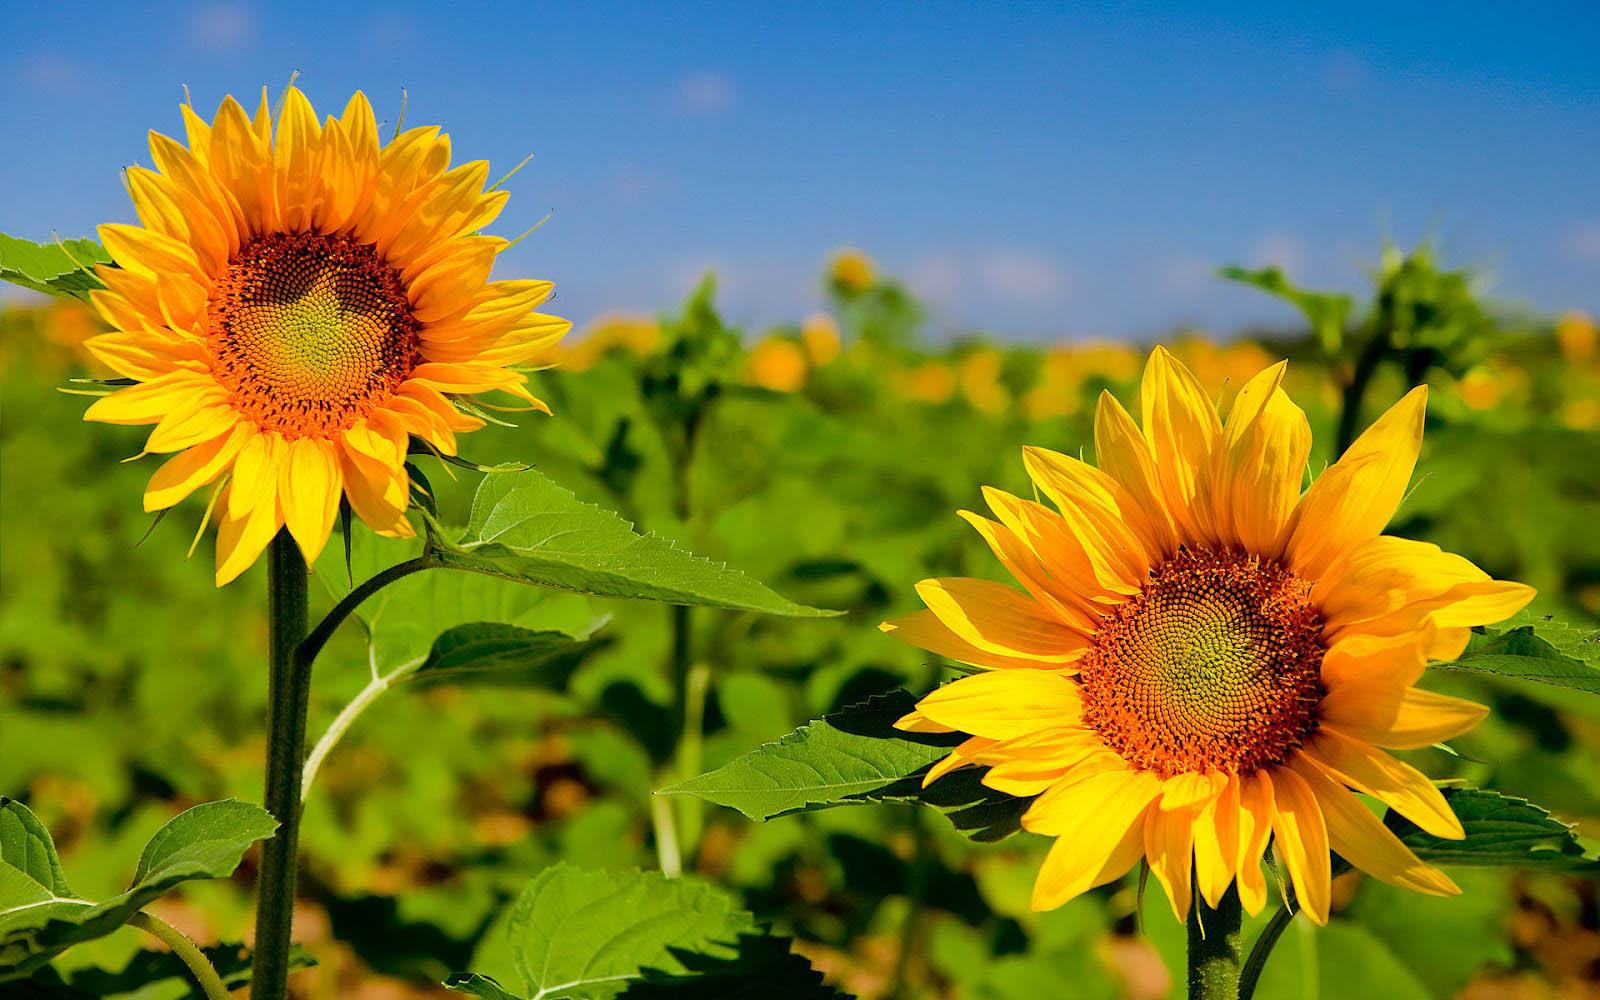 Sunflower Beautiful Wallpapers Hd Wallpapers